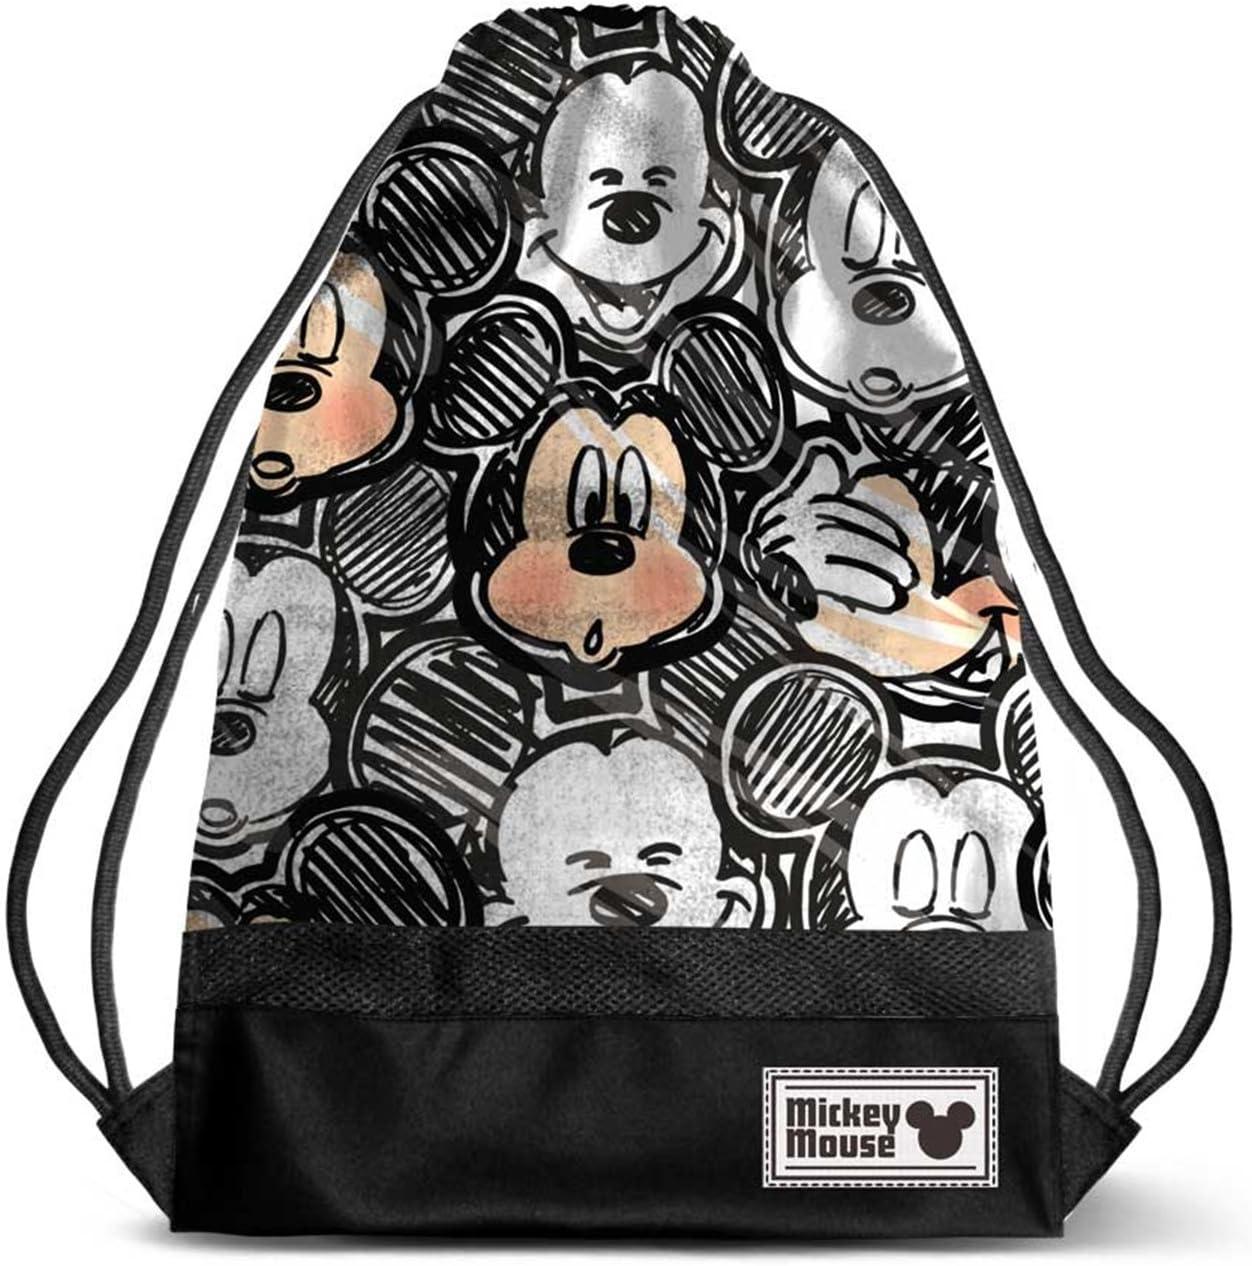 Noir Black 47 cm Karactermania Disney Classic Mickey Oh Boy-Storm Drawstring Bag Sac /à Cordon